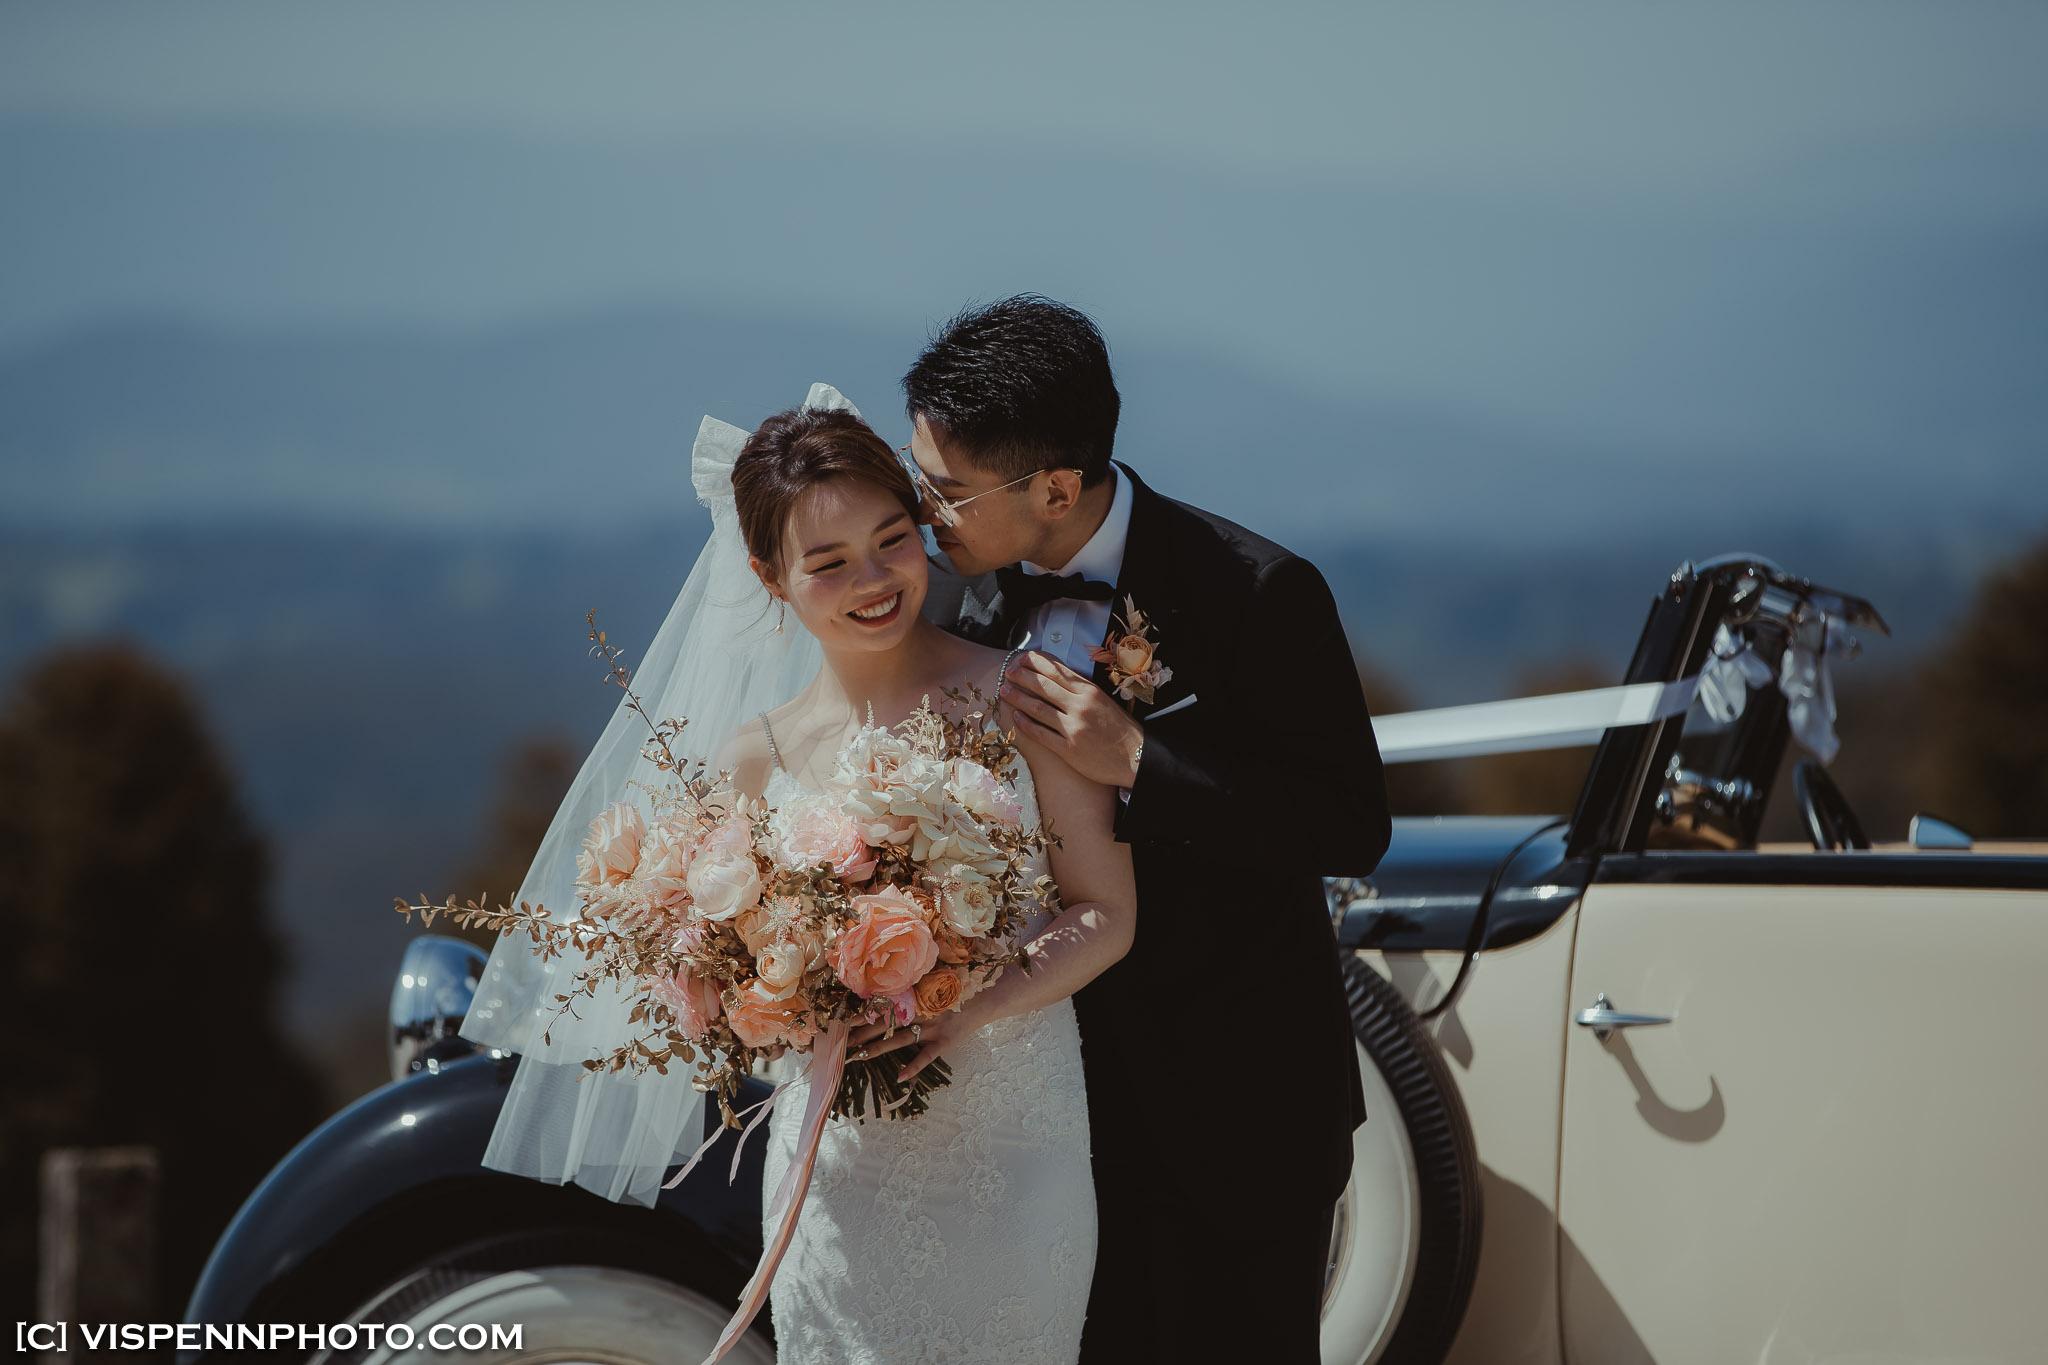 WEDDING DAY Photography Melbourne ElitaPB 06212 2P 1DX2 ZHPENN